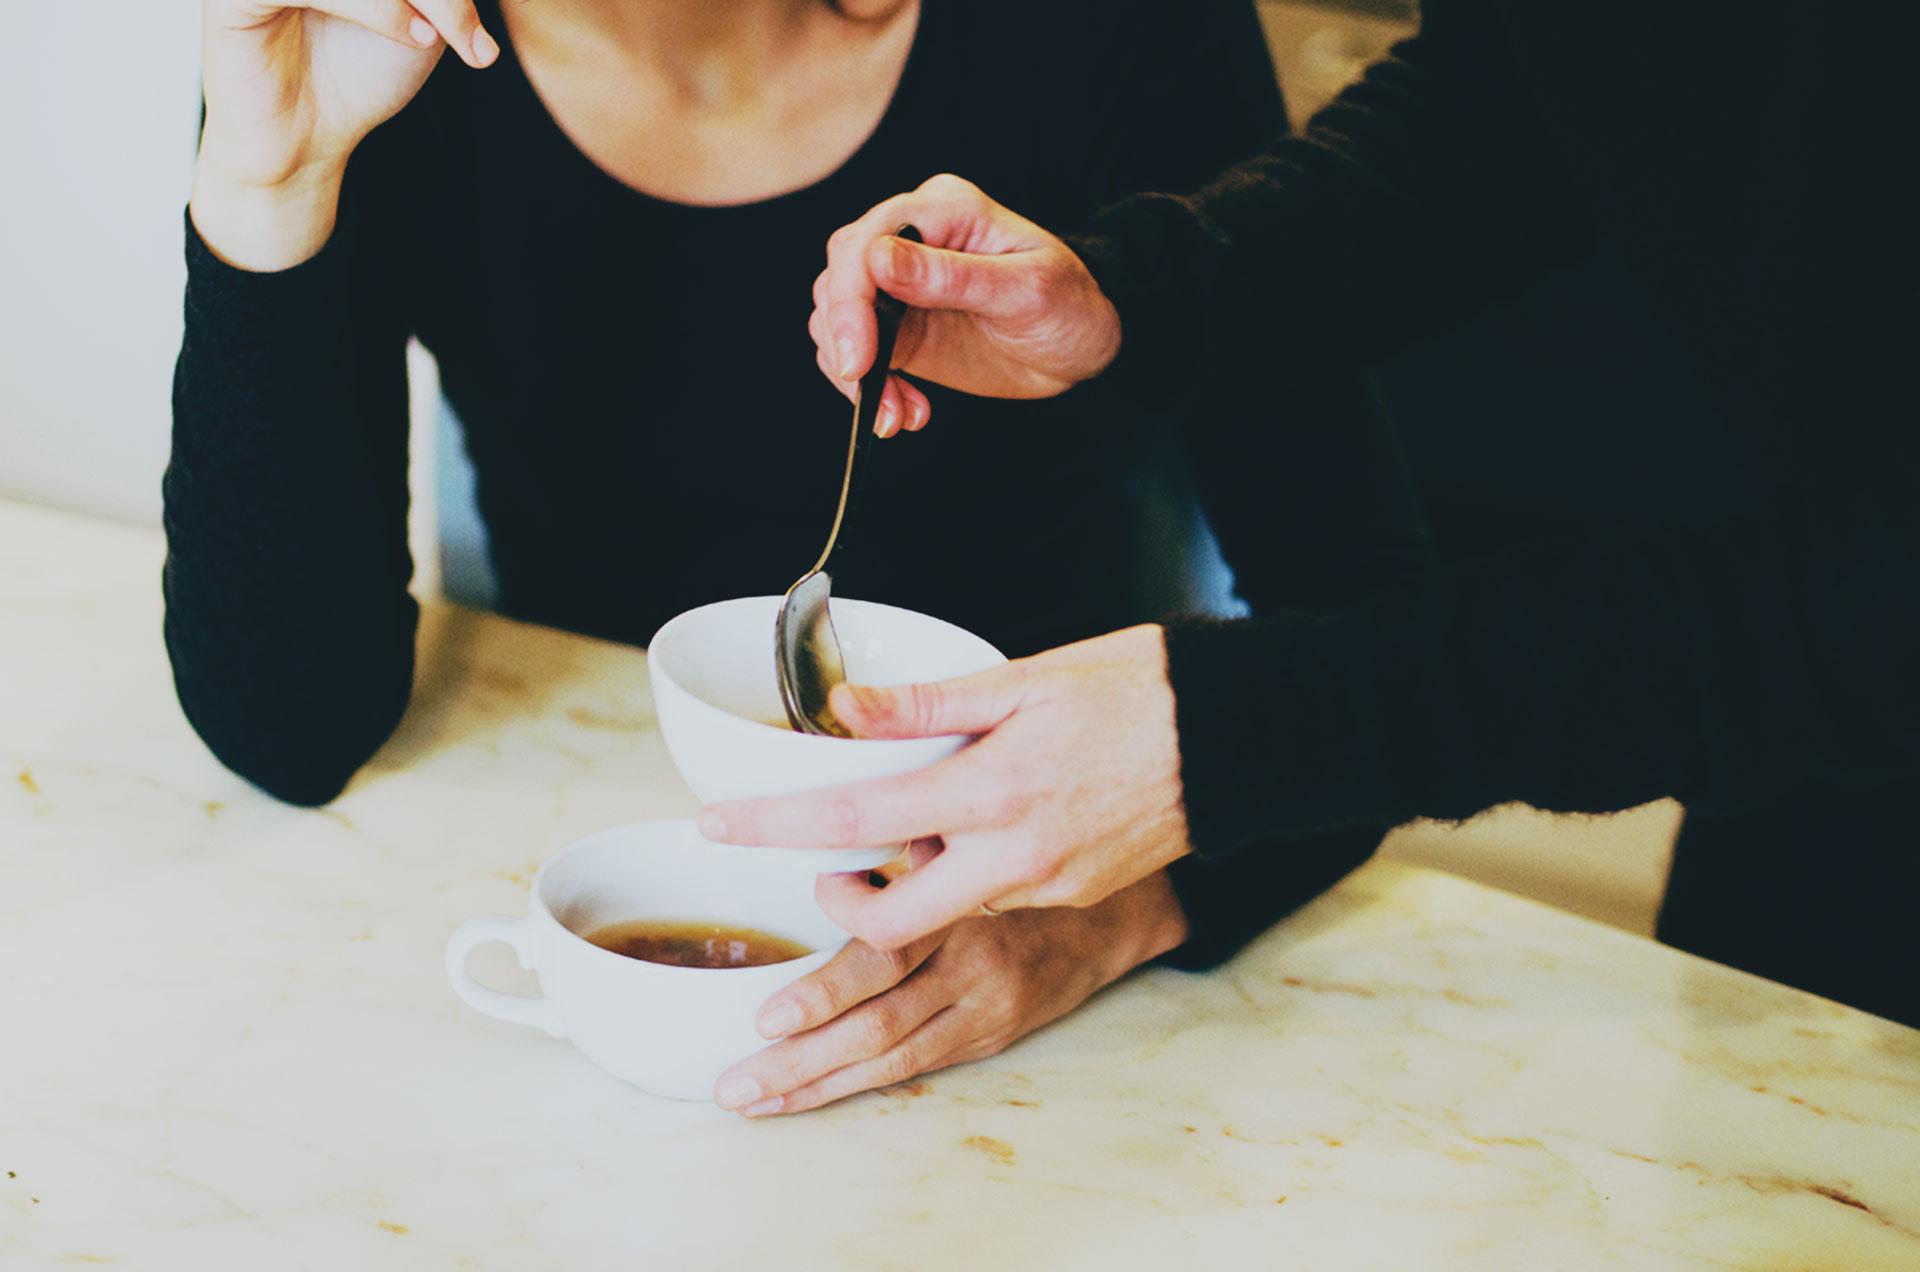 Foodadit-recipe-Alanna-Natasha-Lawley-Sally-Ross-Clark-kuzu-Berlin